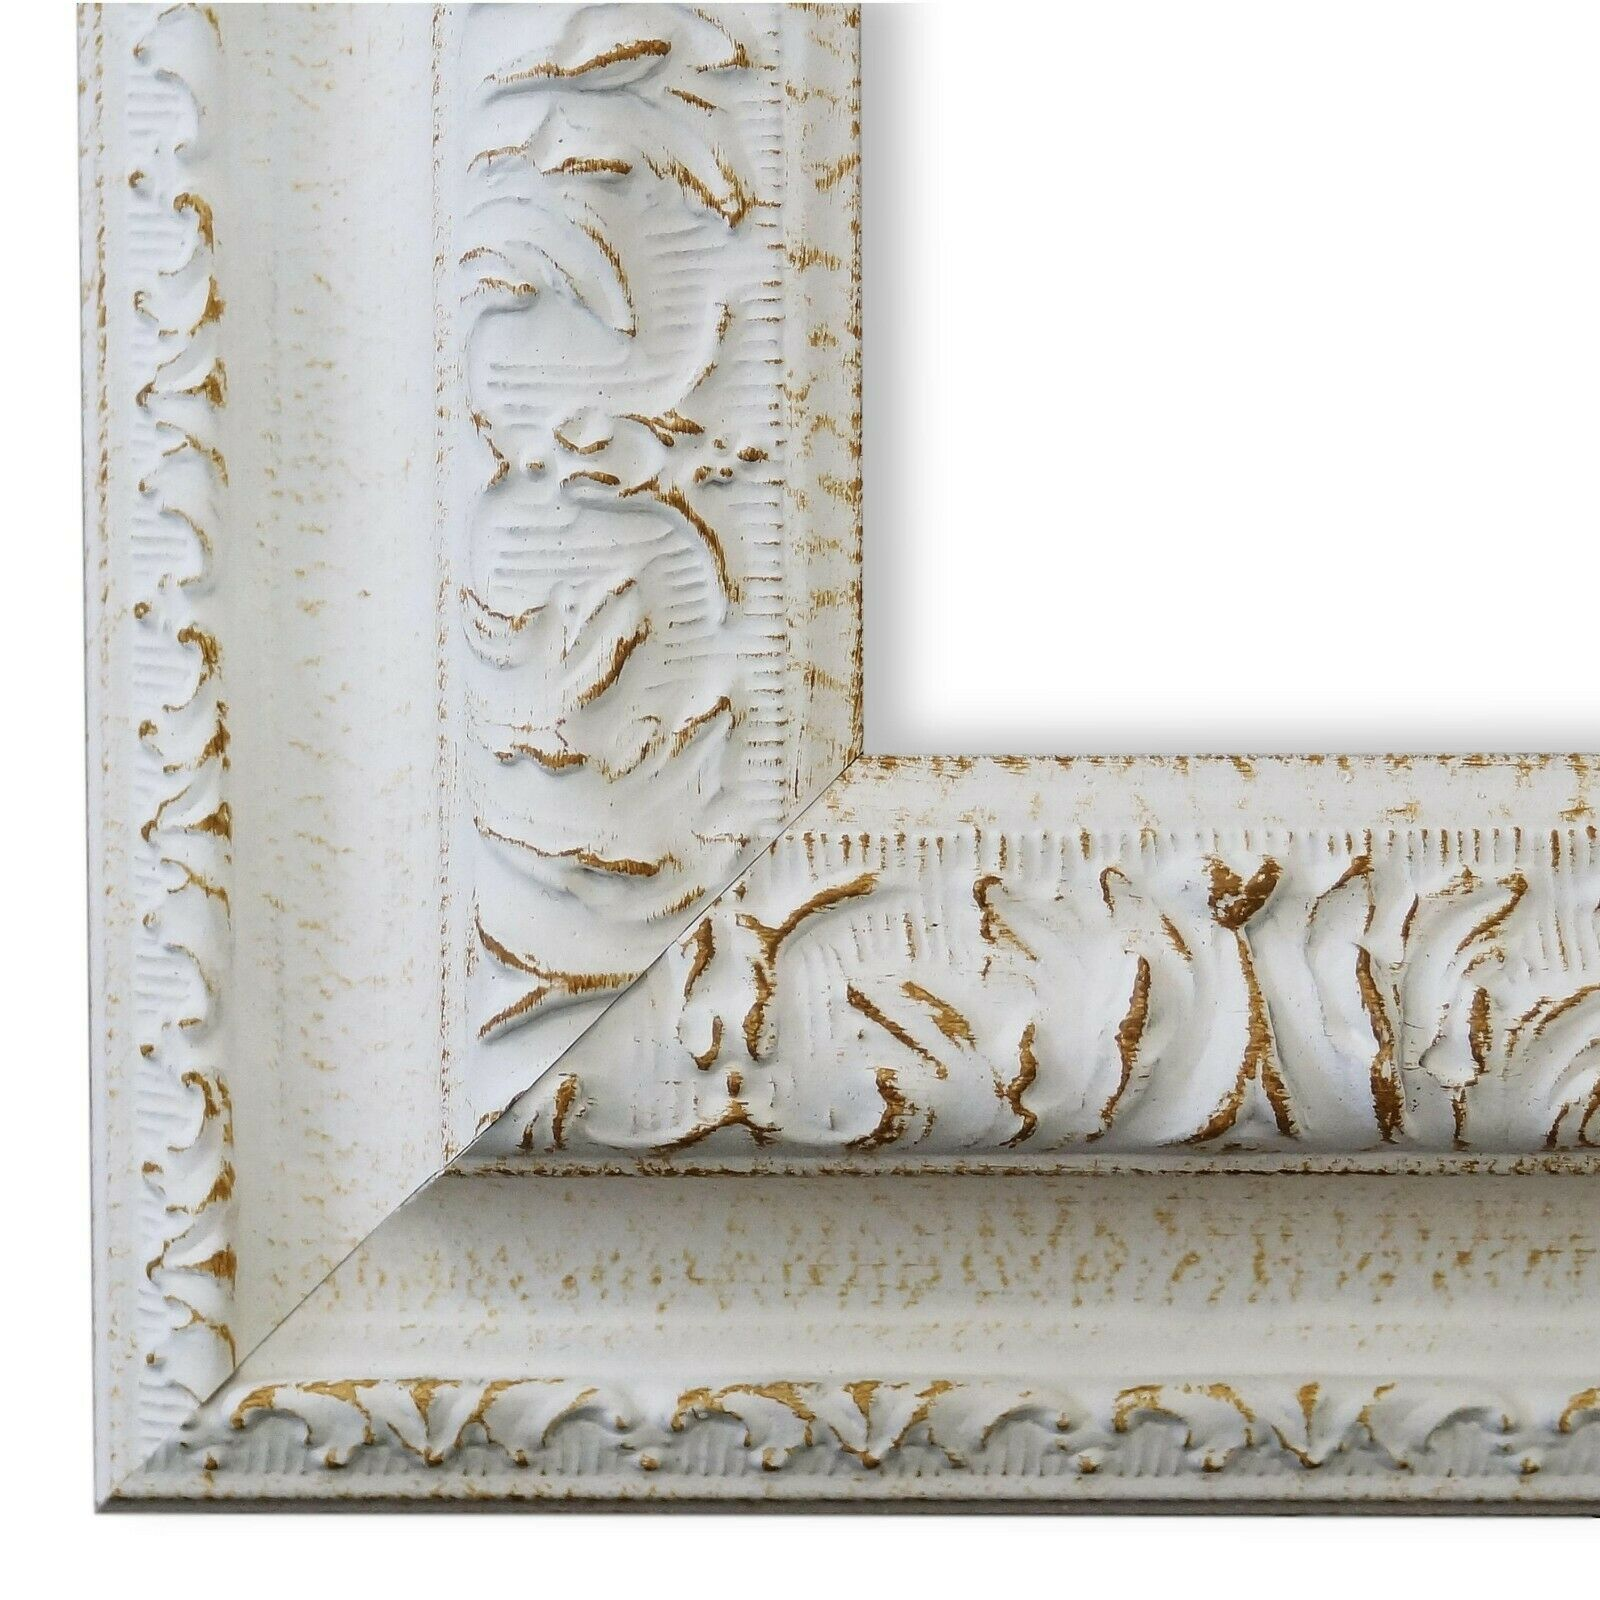 Bilderrahmen Rahmen Weiss Barock Vintage Holz Rom 6,5 - NEU alle Größen